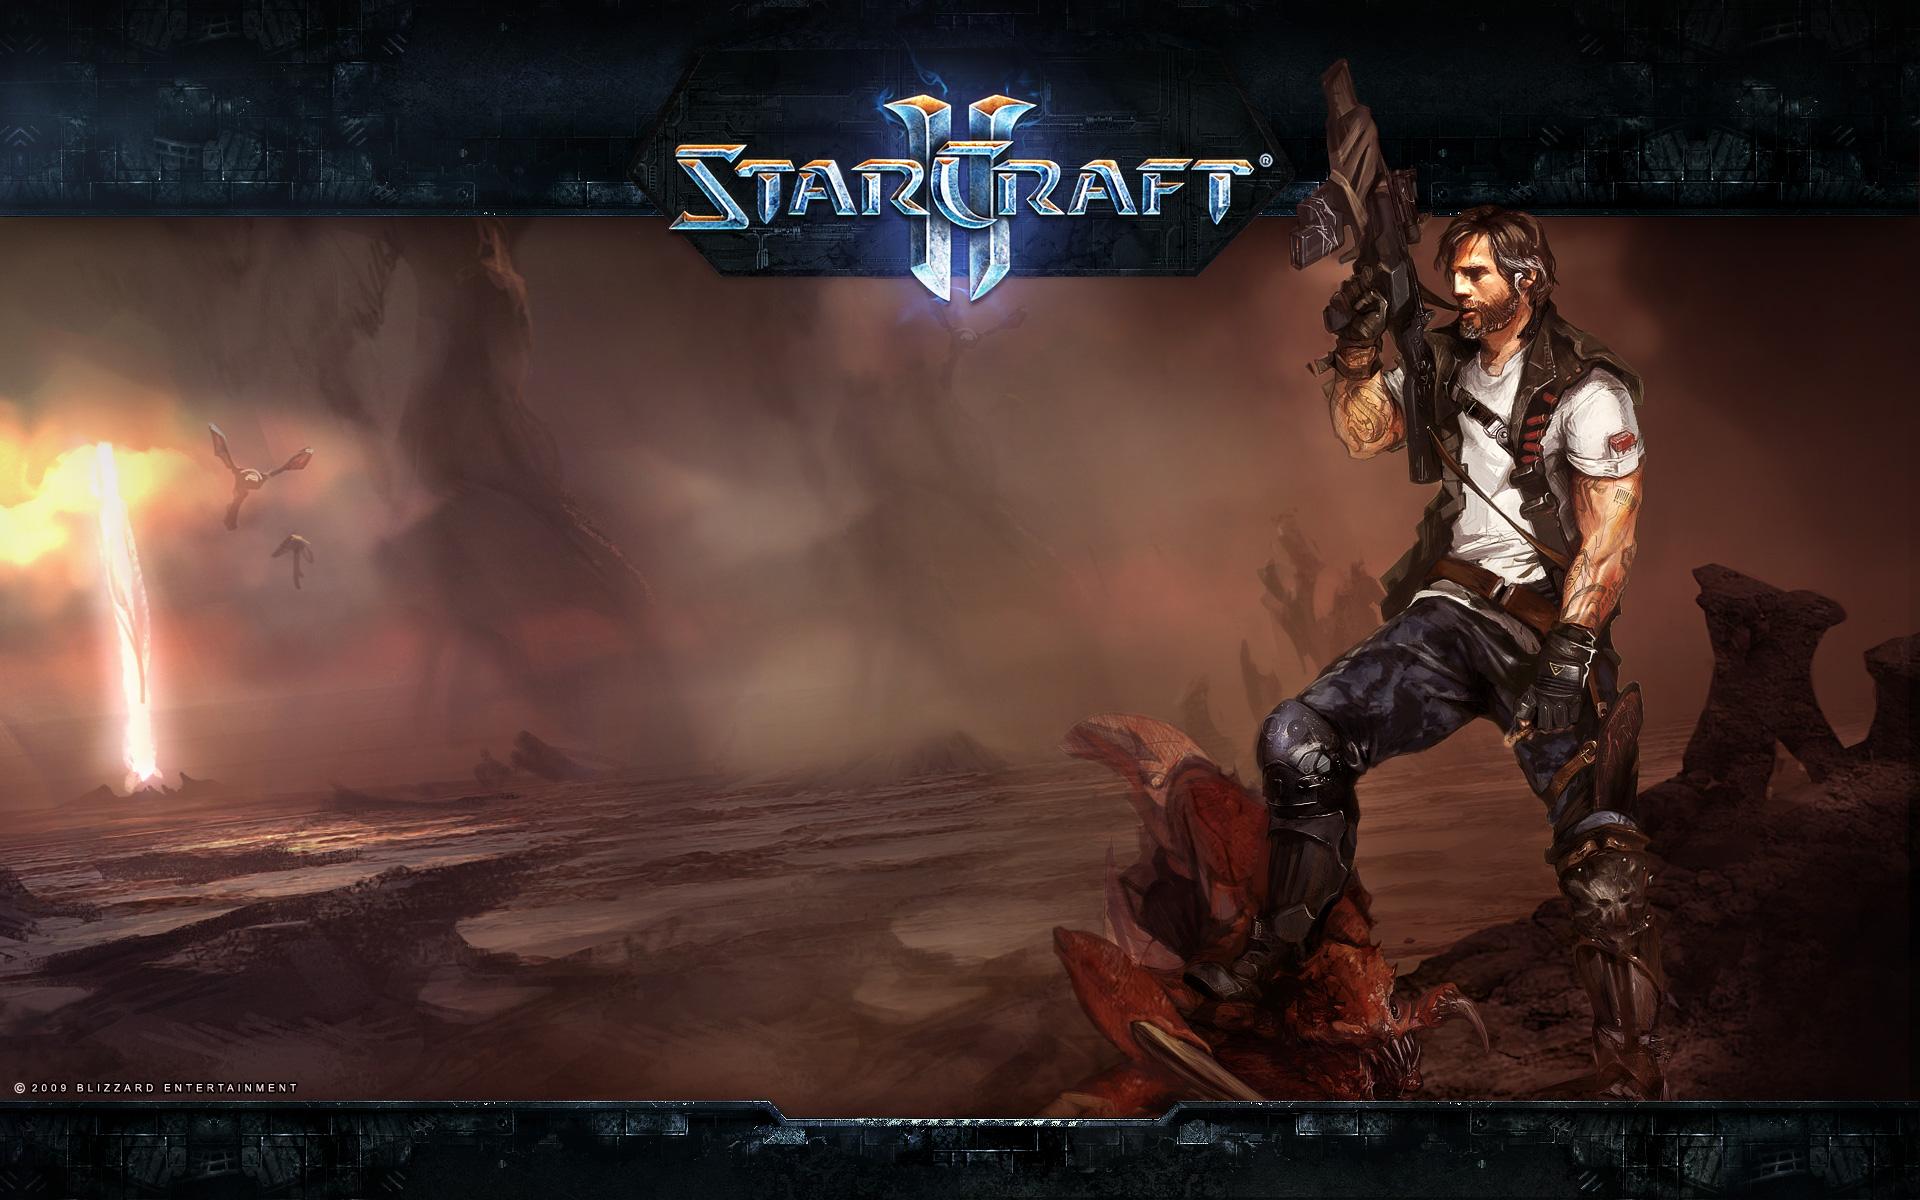 Starcraft Ii Free Wallpaper Wallpaperjam Com